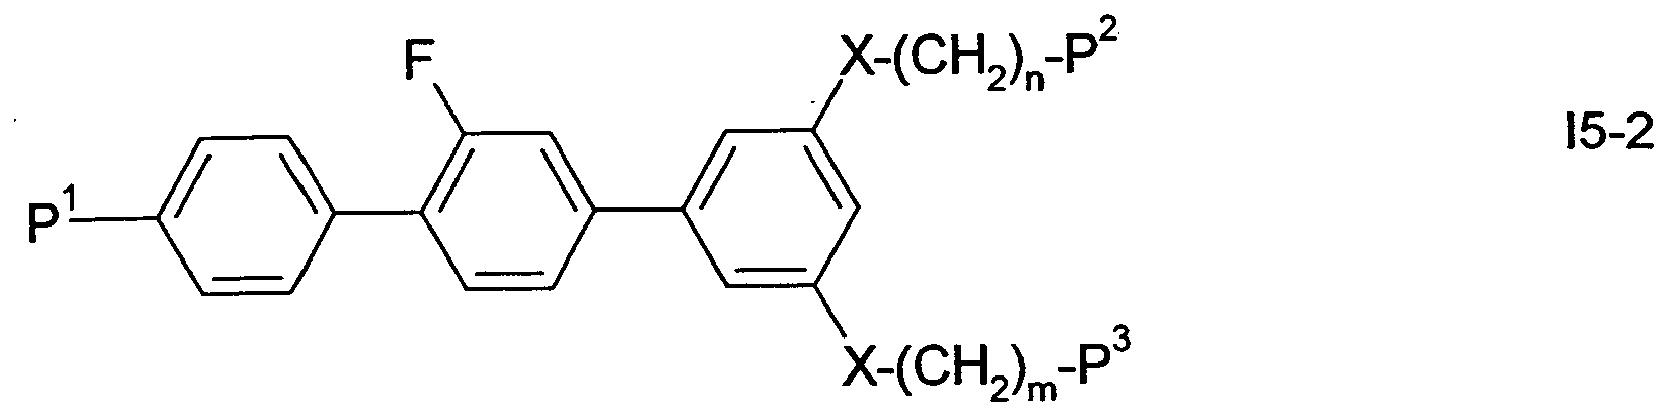 Figure imgb0733